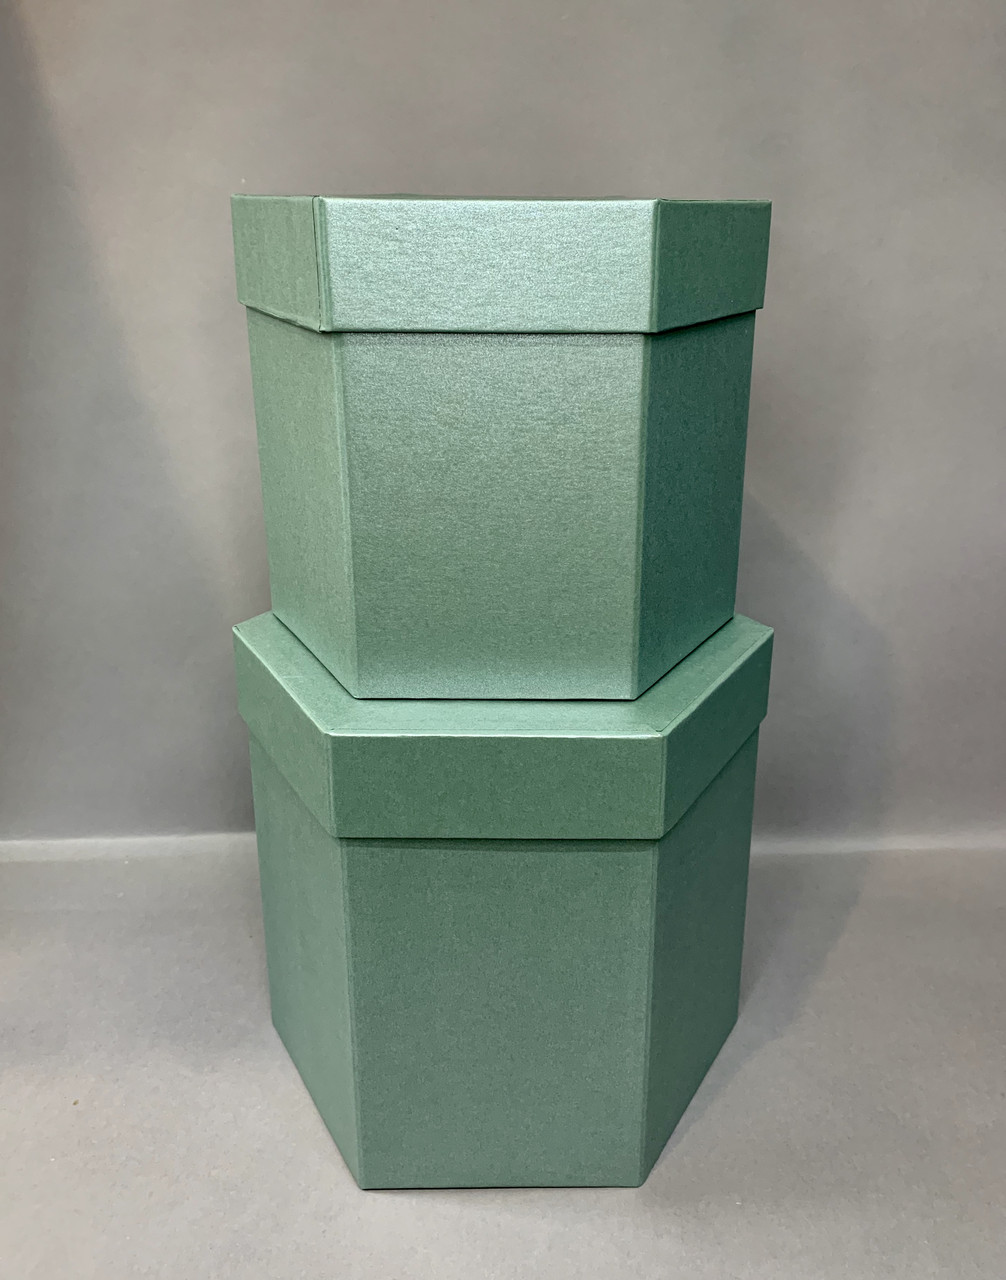 Коробка шестигранная(изумруд серебро)